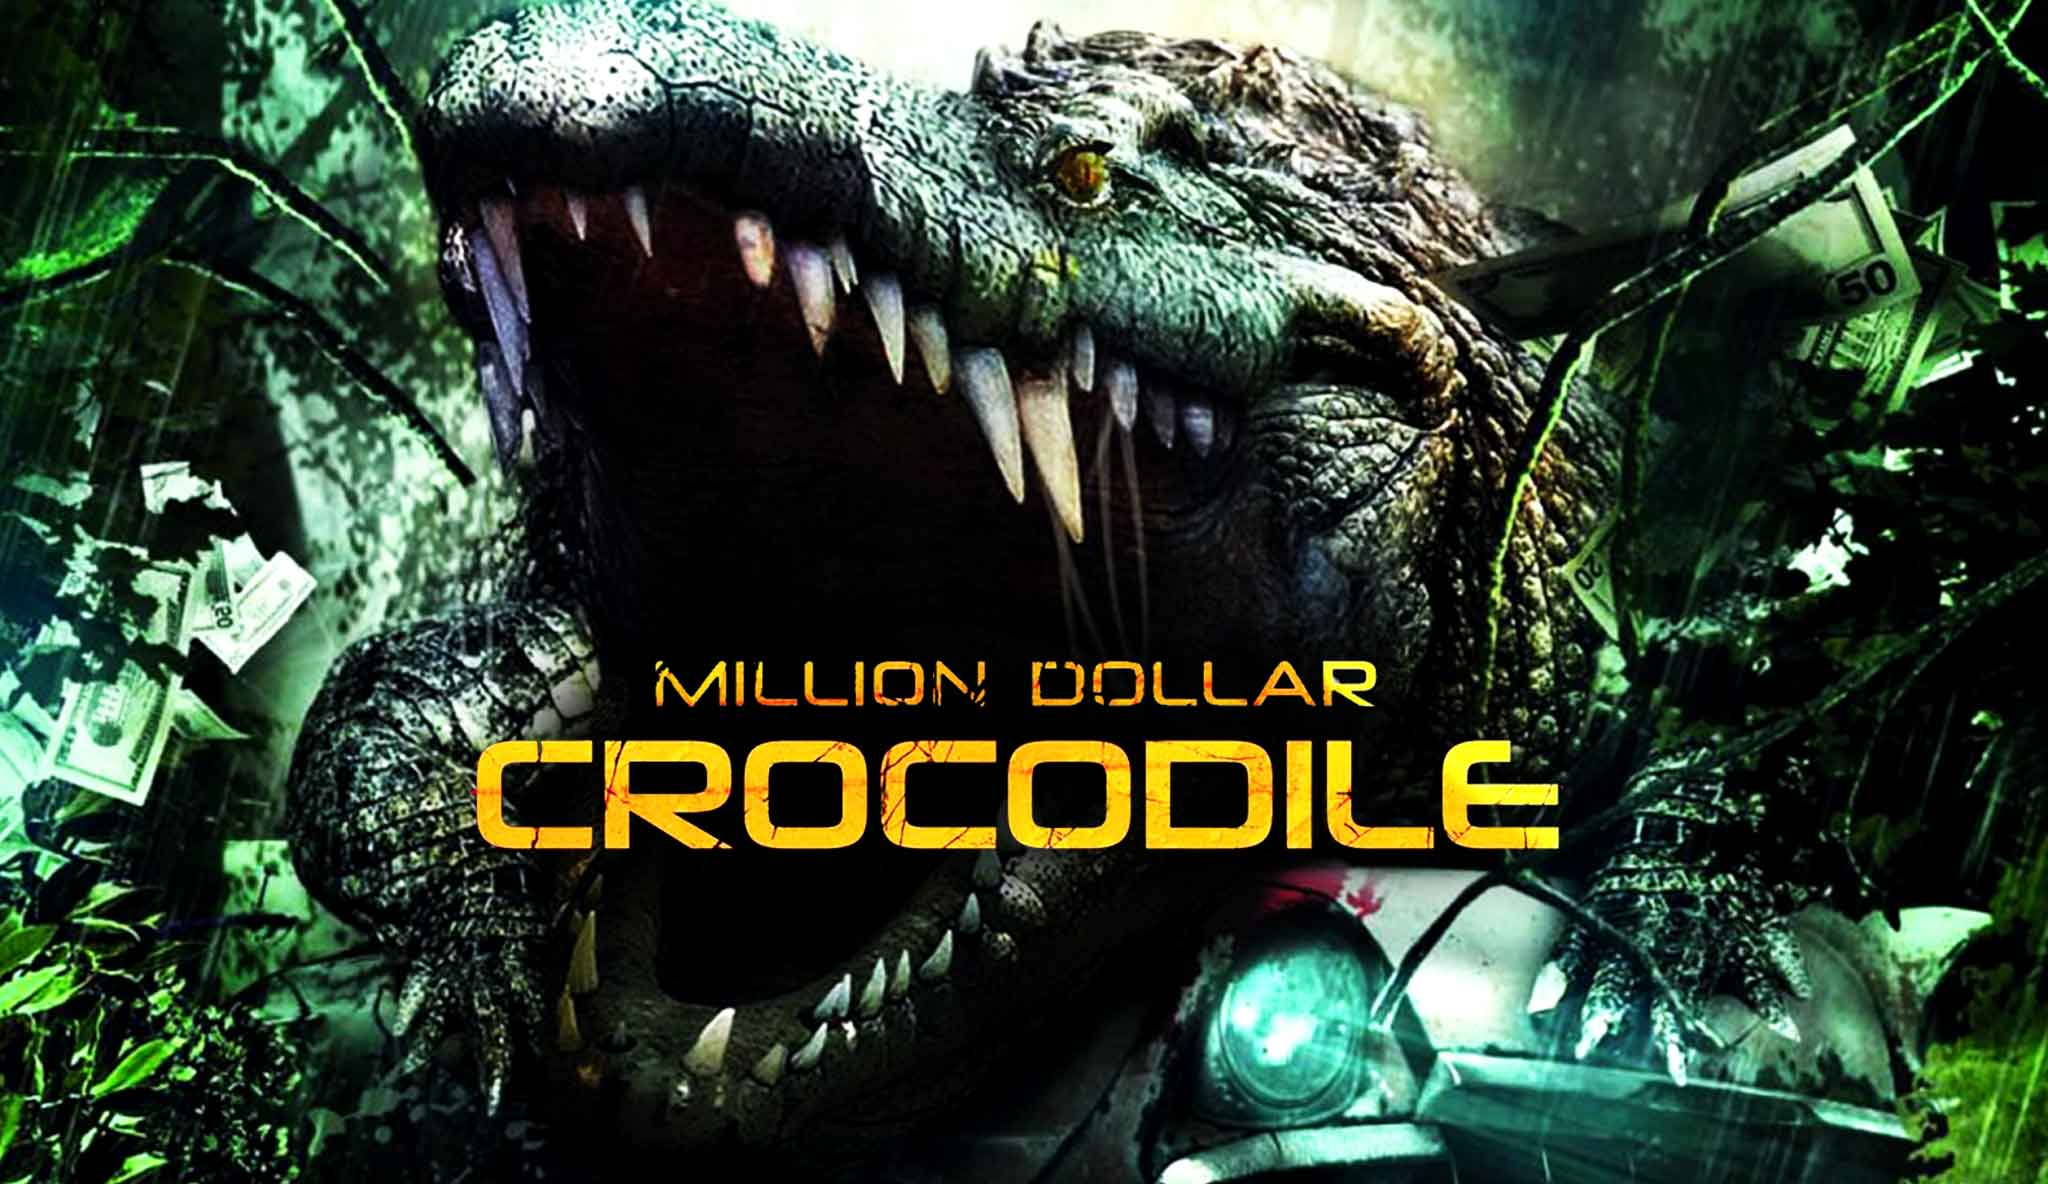 million-dollar-crocodile\header.jpg